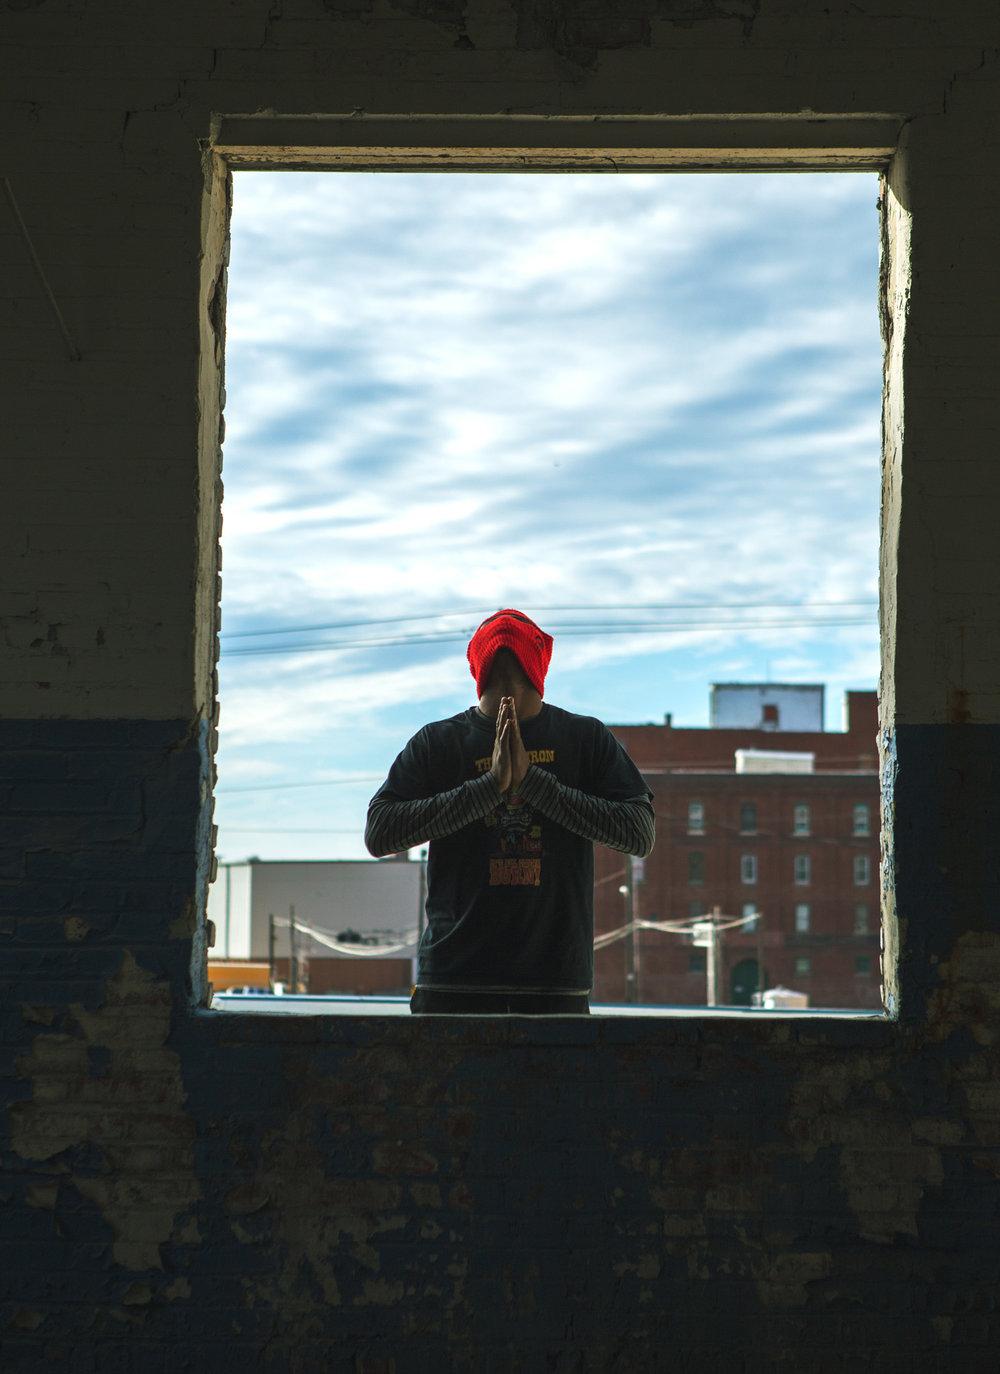 Image of man looking up and praying